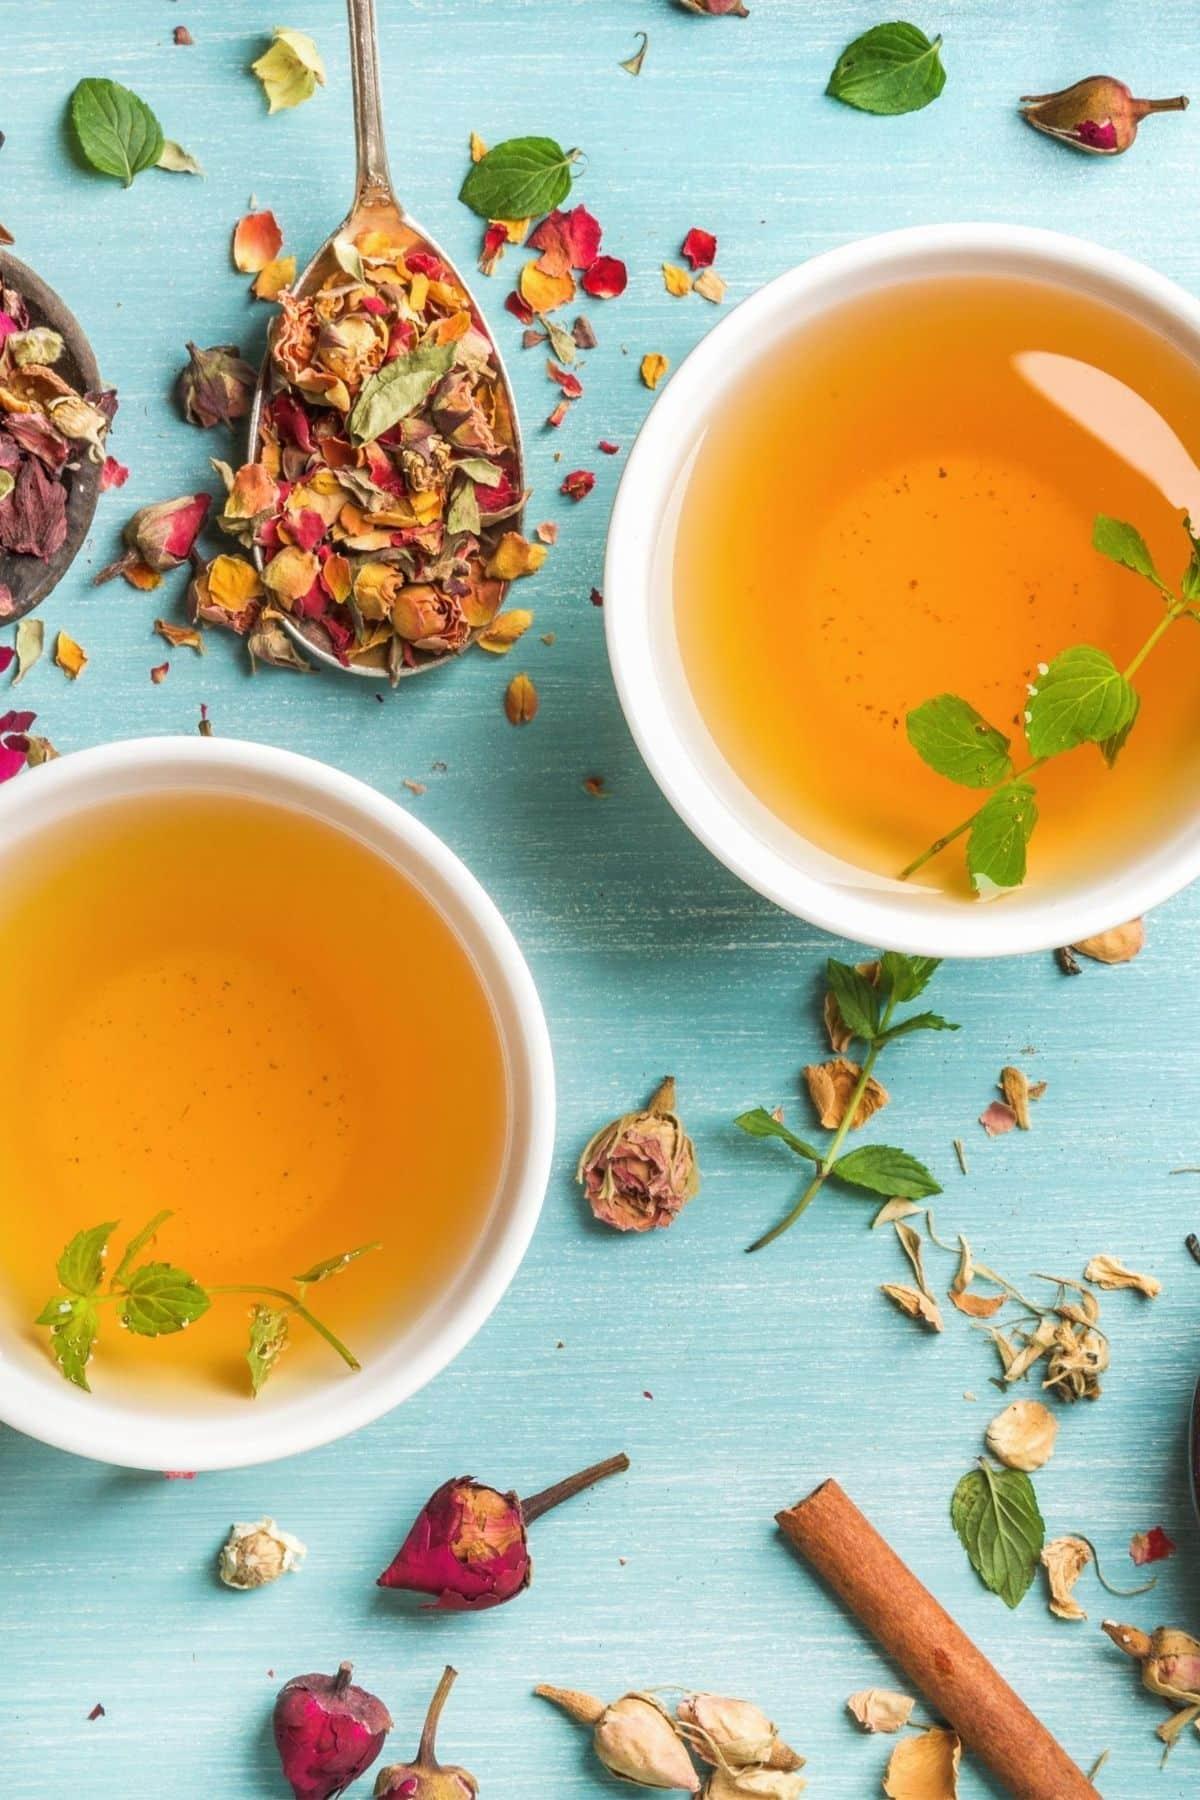 two mugs of herbal tea